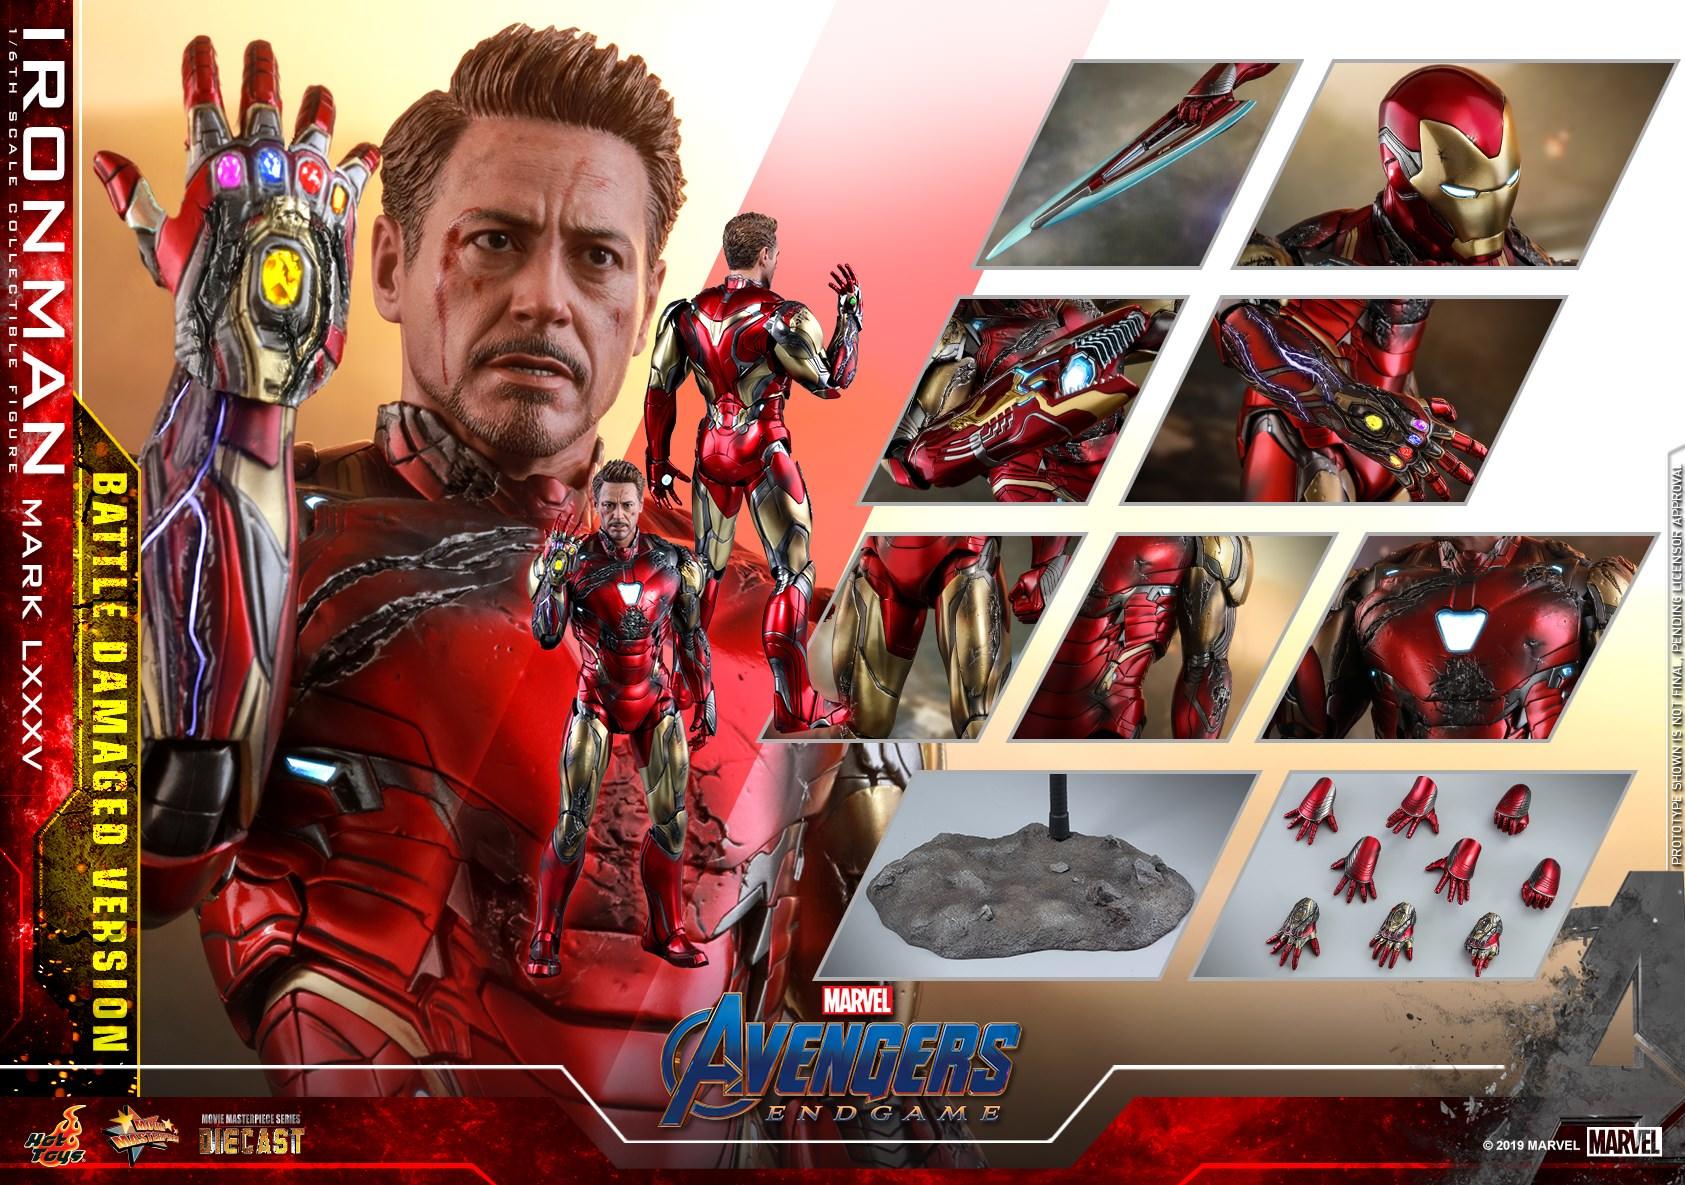 Hot Toys MMS 543 D33 Avengers : Endgame – Iron Man Mark LXXXV (Battle Damaged)